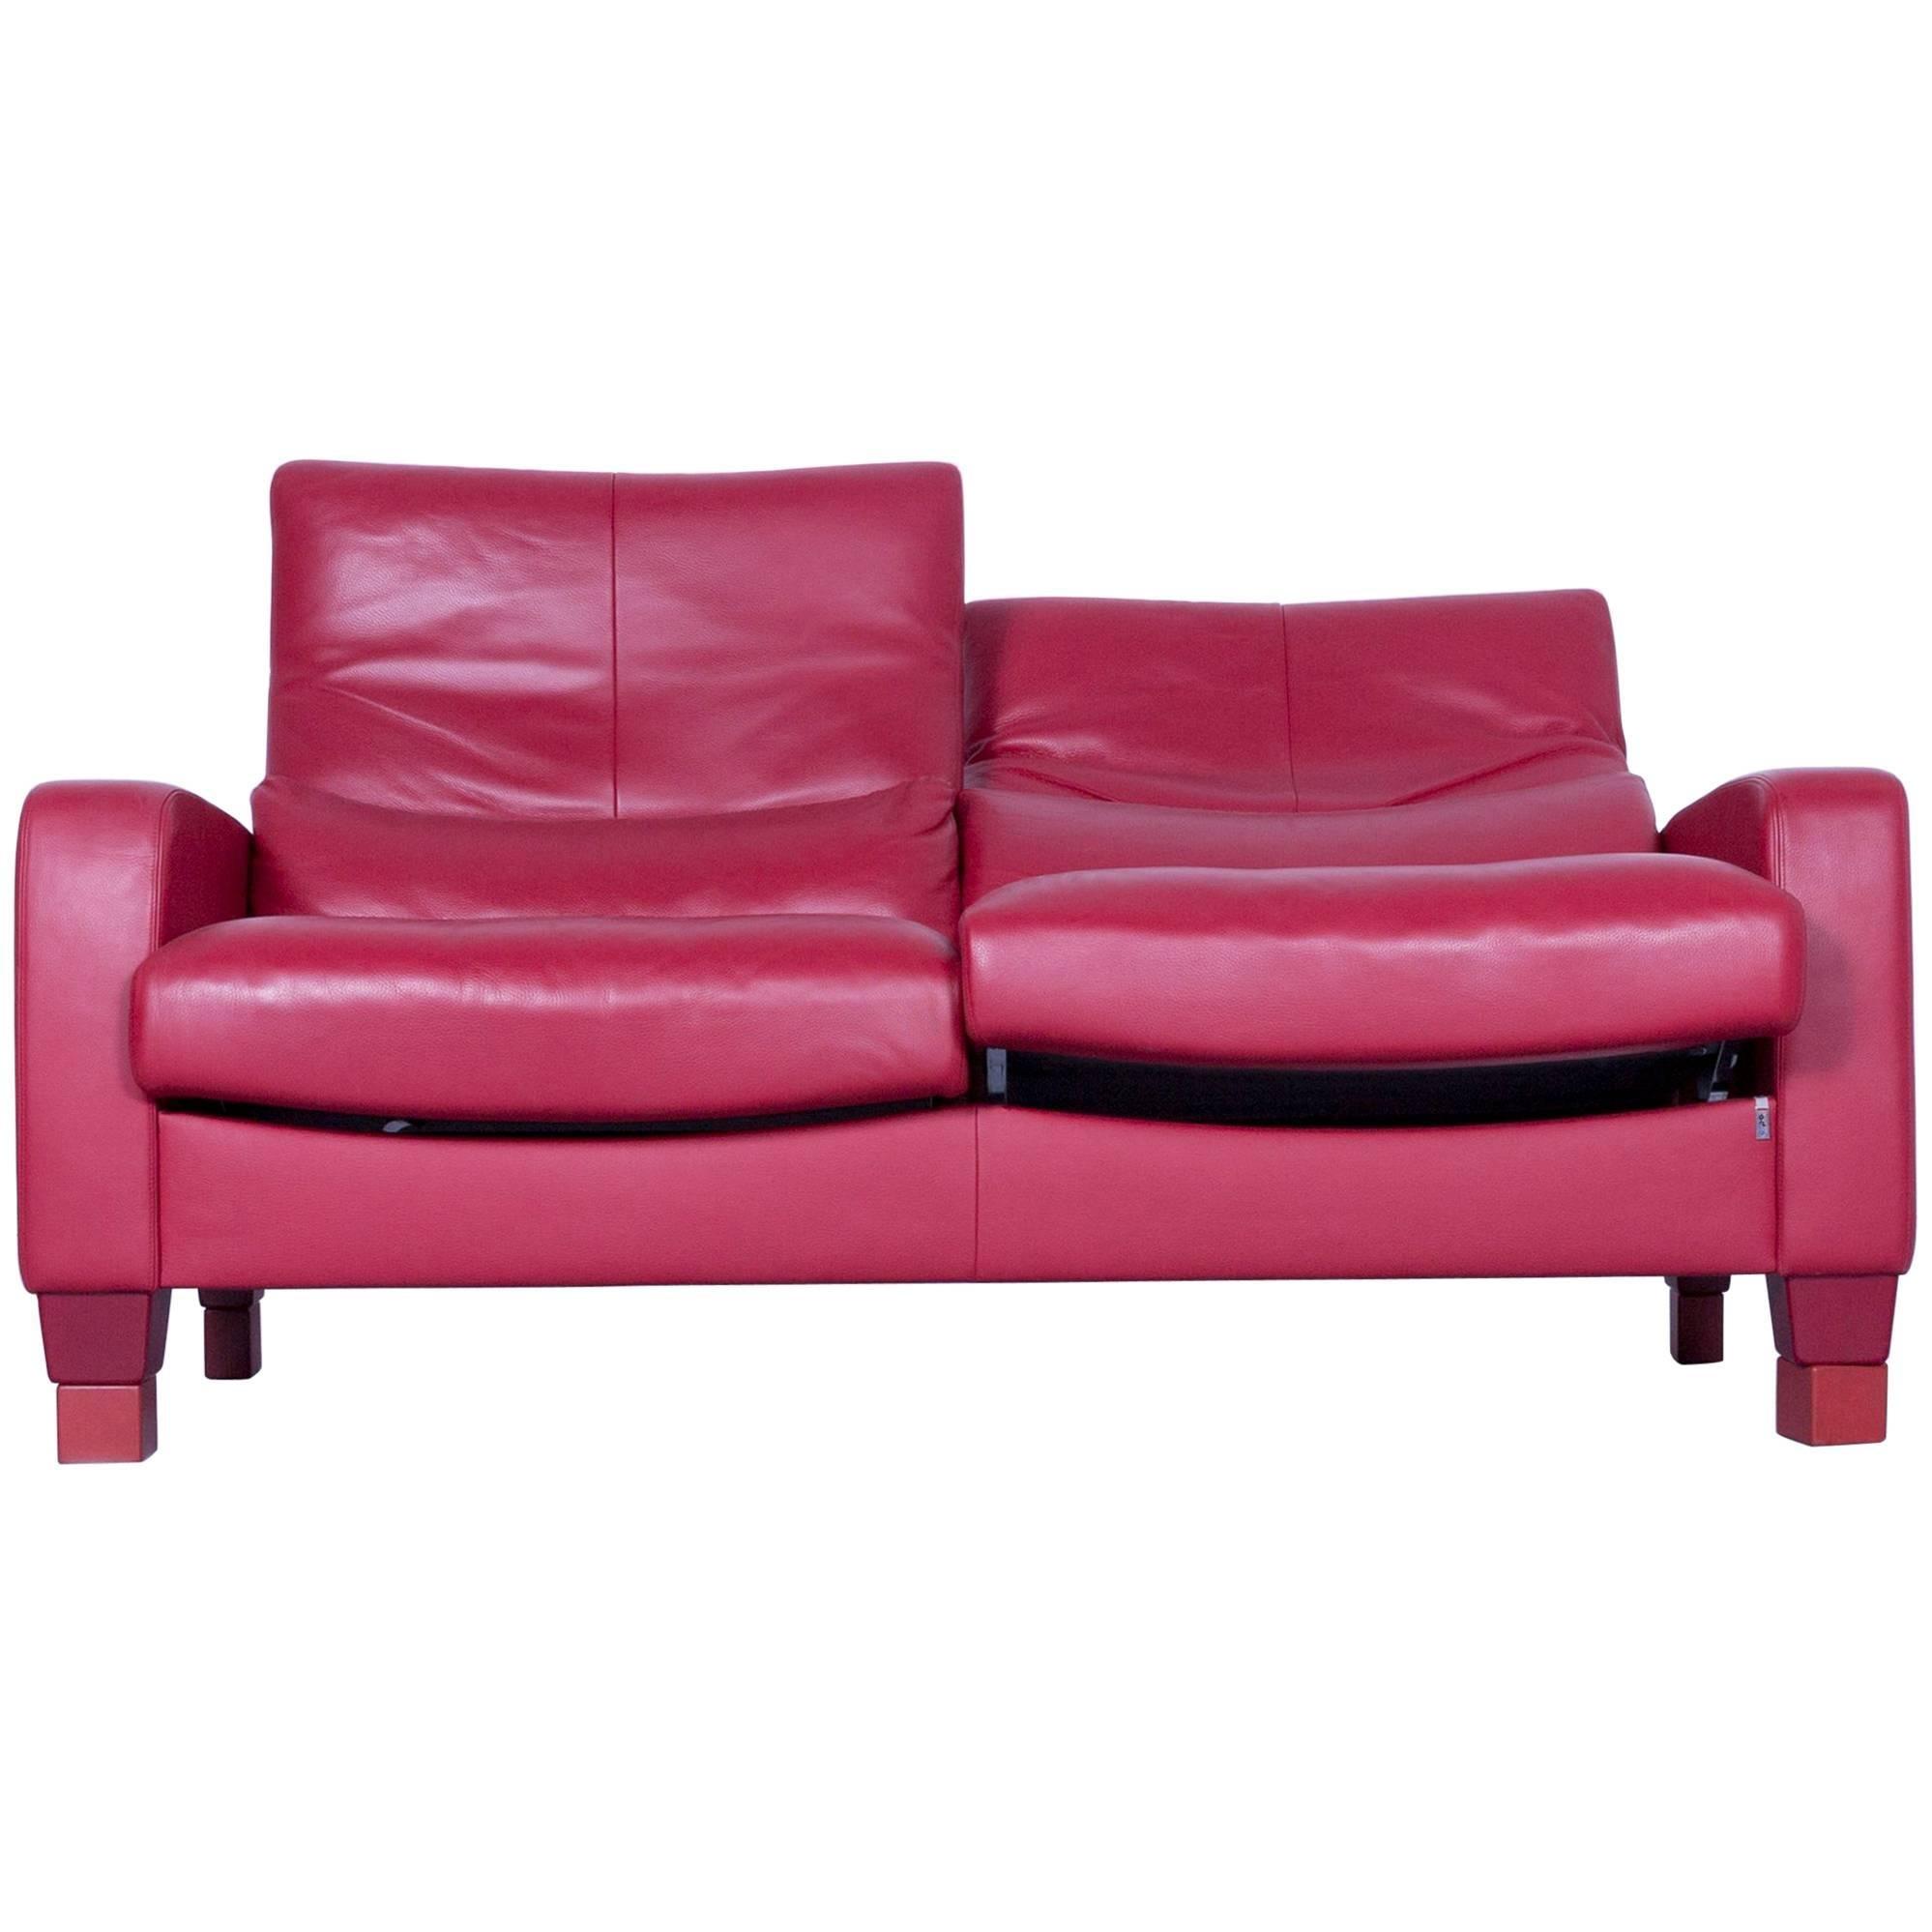 erpo sofa wohnzimmer mit rotem sofa awesome sofa design herrlich mit roten mbeln rote hd. Black Bedroom Furniture Sets. Home Design Ideas